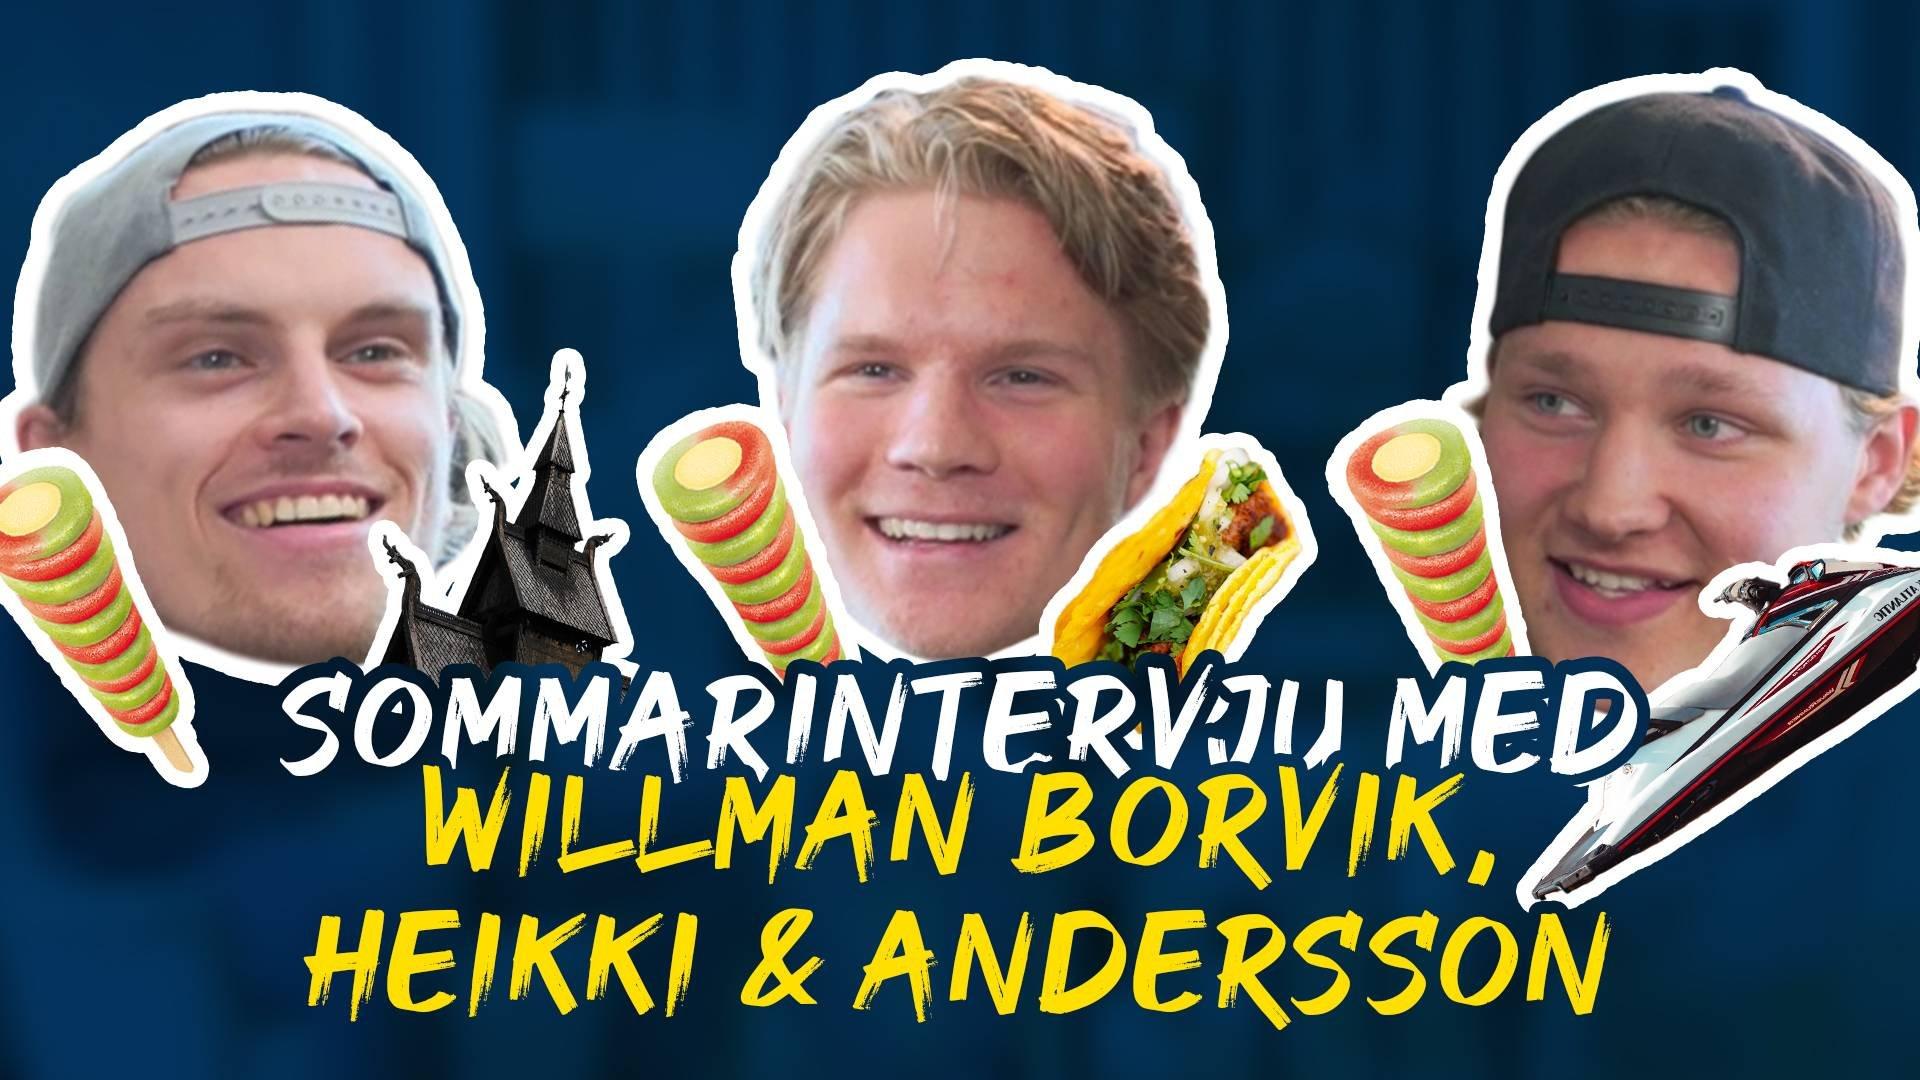 Sommarintervju med Willman Borvik, Heikki & Andersson